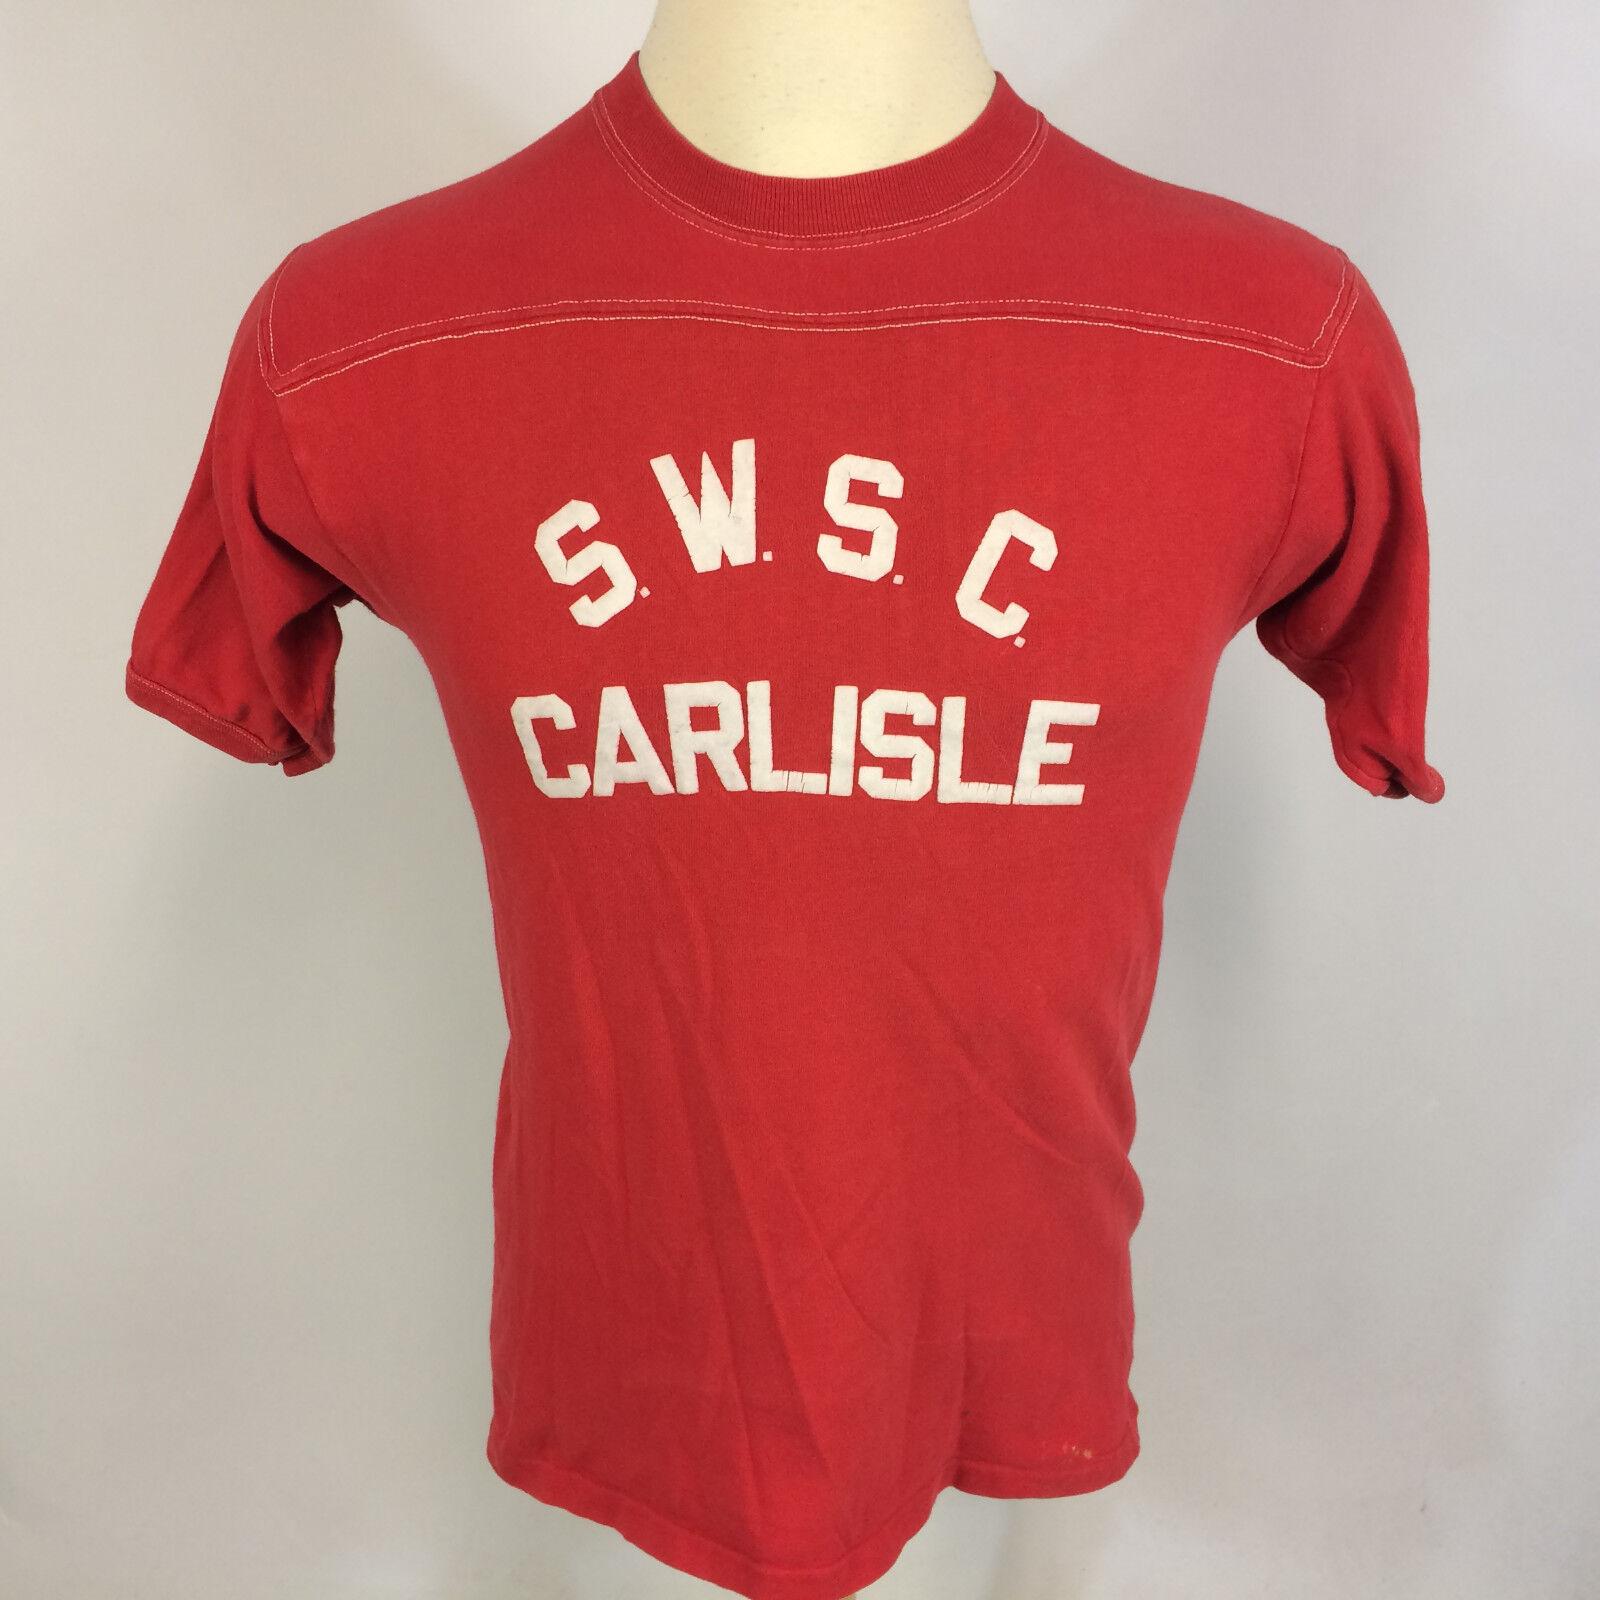 Vintage 70s 80s Stedman Sport T T Shirt Distressed Worn Thin High School Gym M